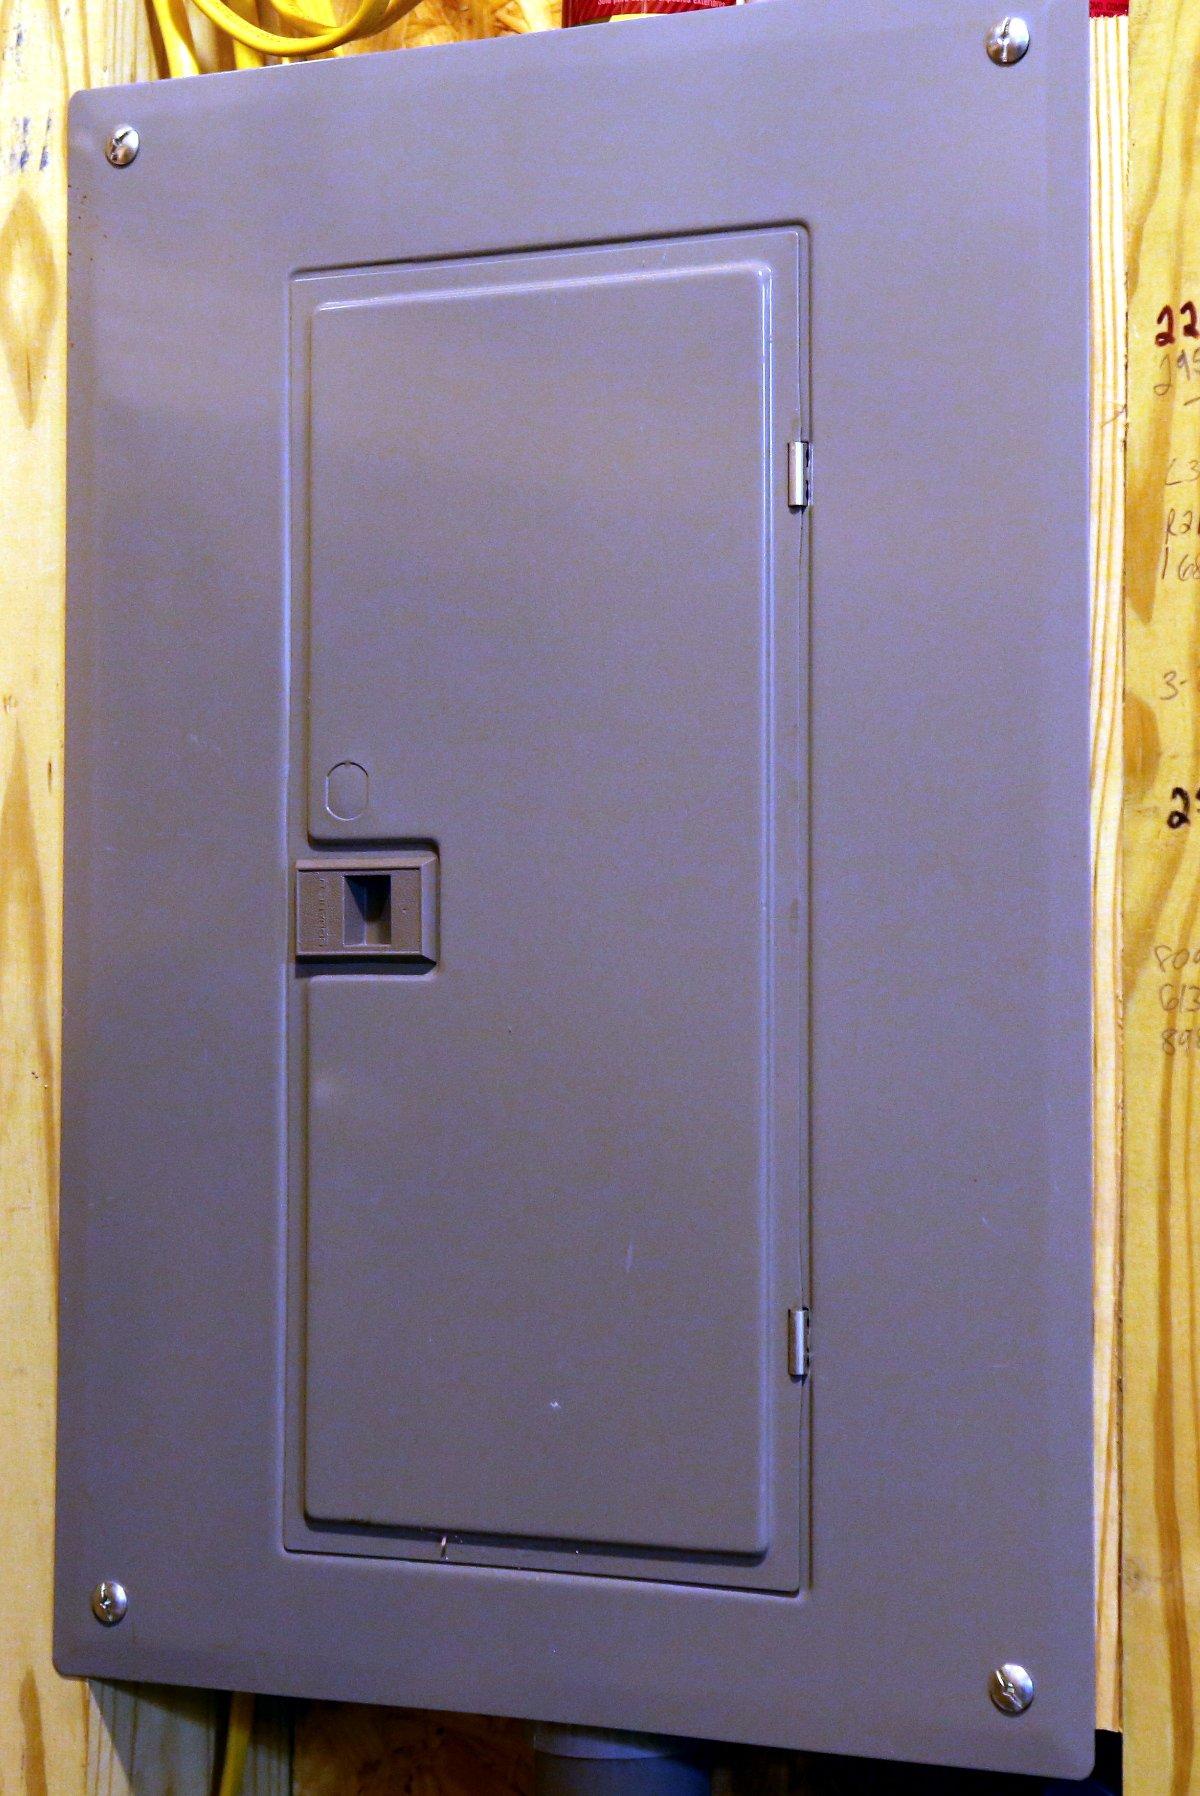 Schön Electrical Panel Galerie - Schaltplan Serie Circuit Collection ...